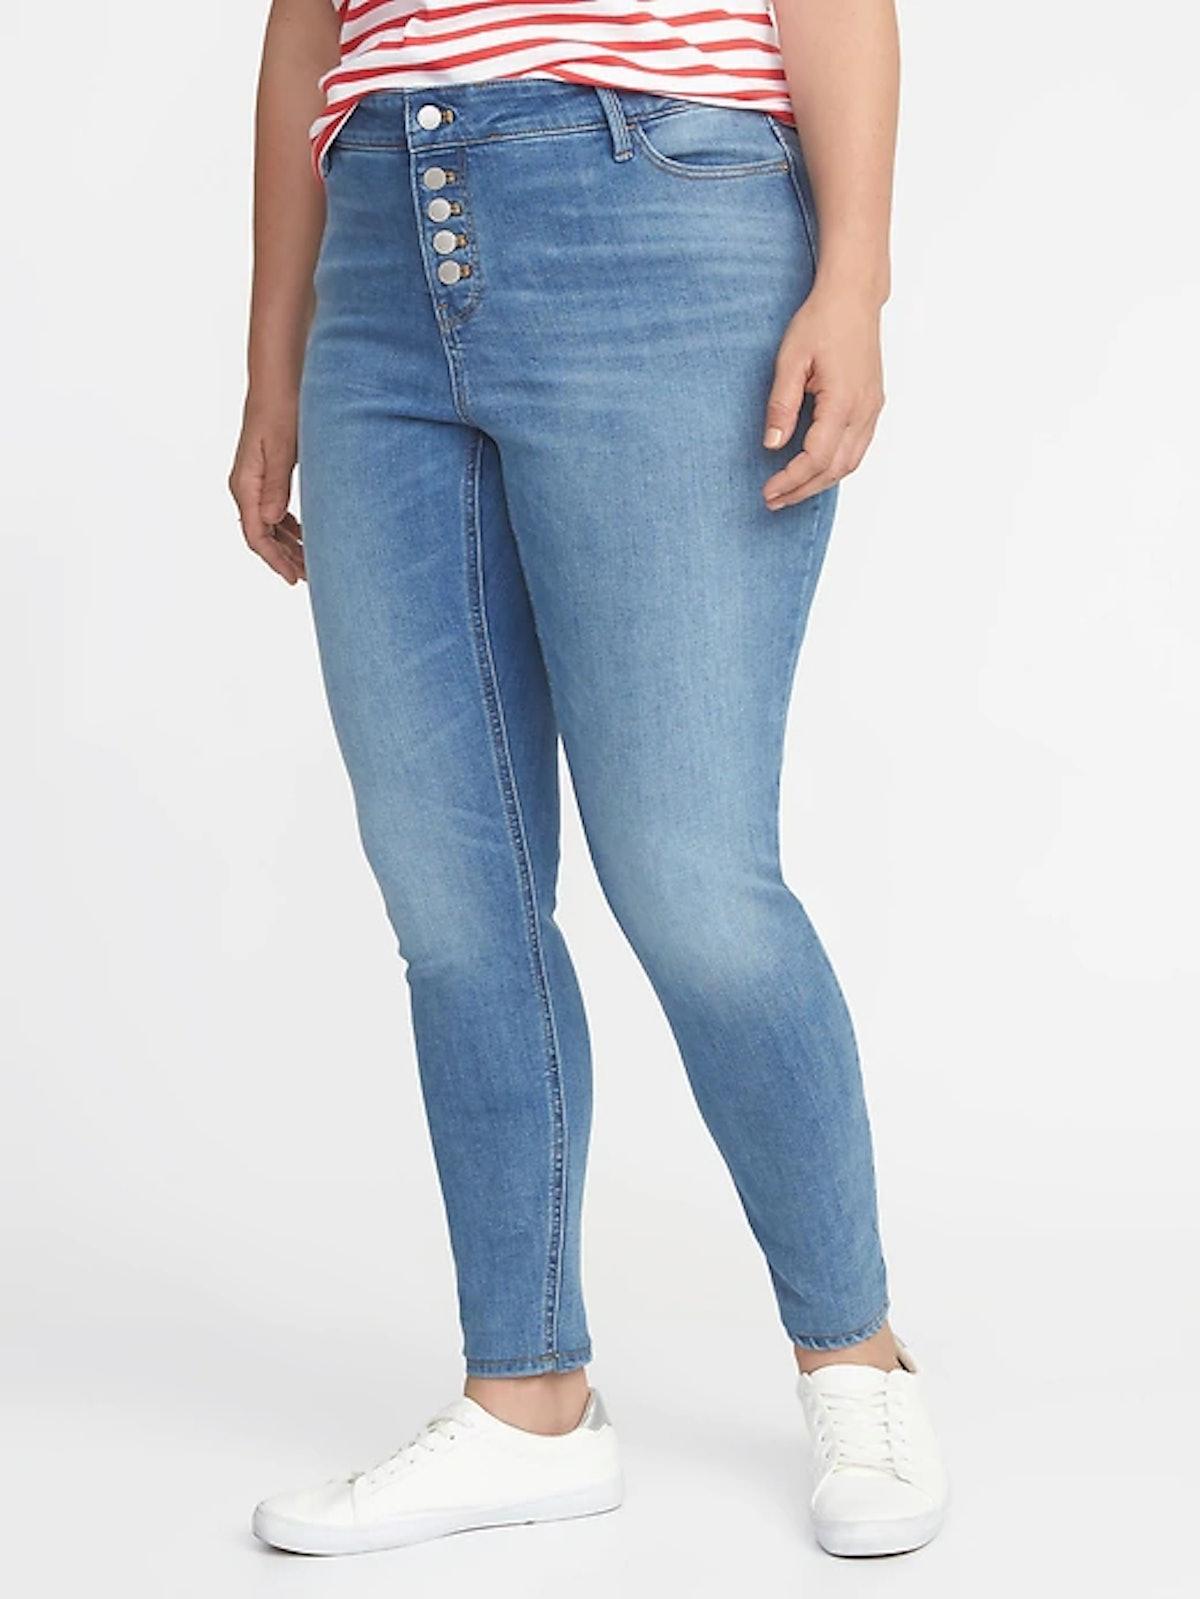 High-Rise Secret-Slim Pockets Plus-Size Button-Fly Rockstar Jeans